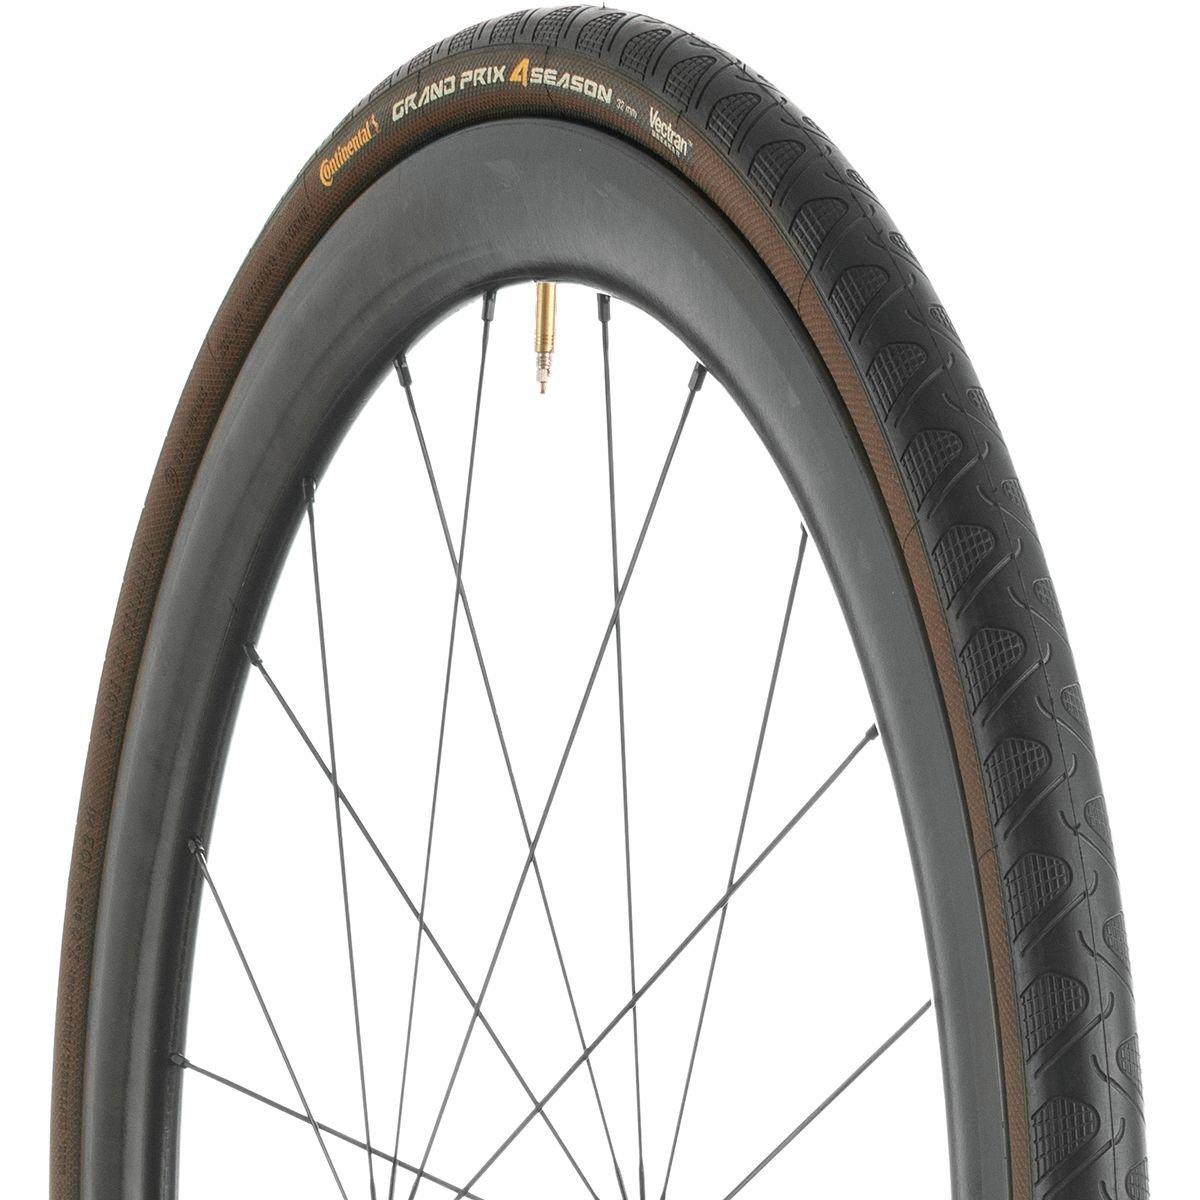 Continental Grand Prix 4 Season Tire - Clincher Black-Duraskin, 700c x 28mm